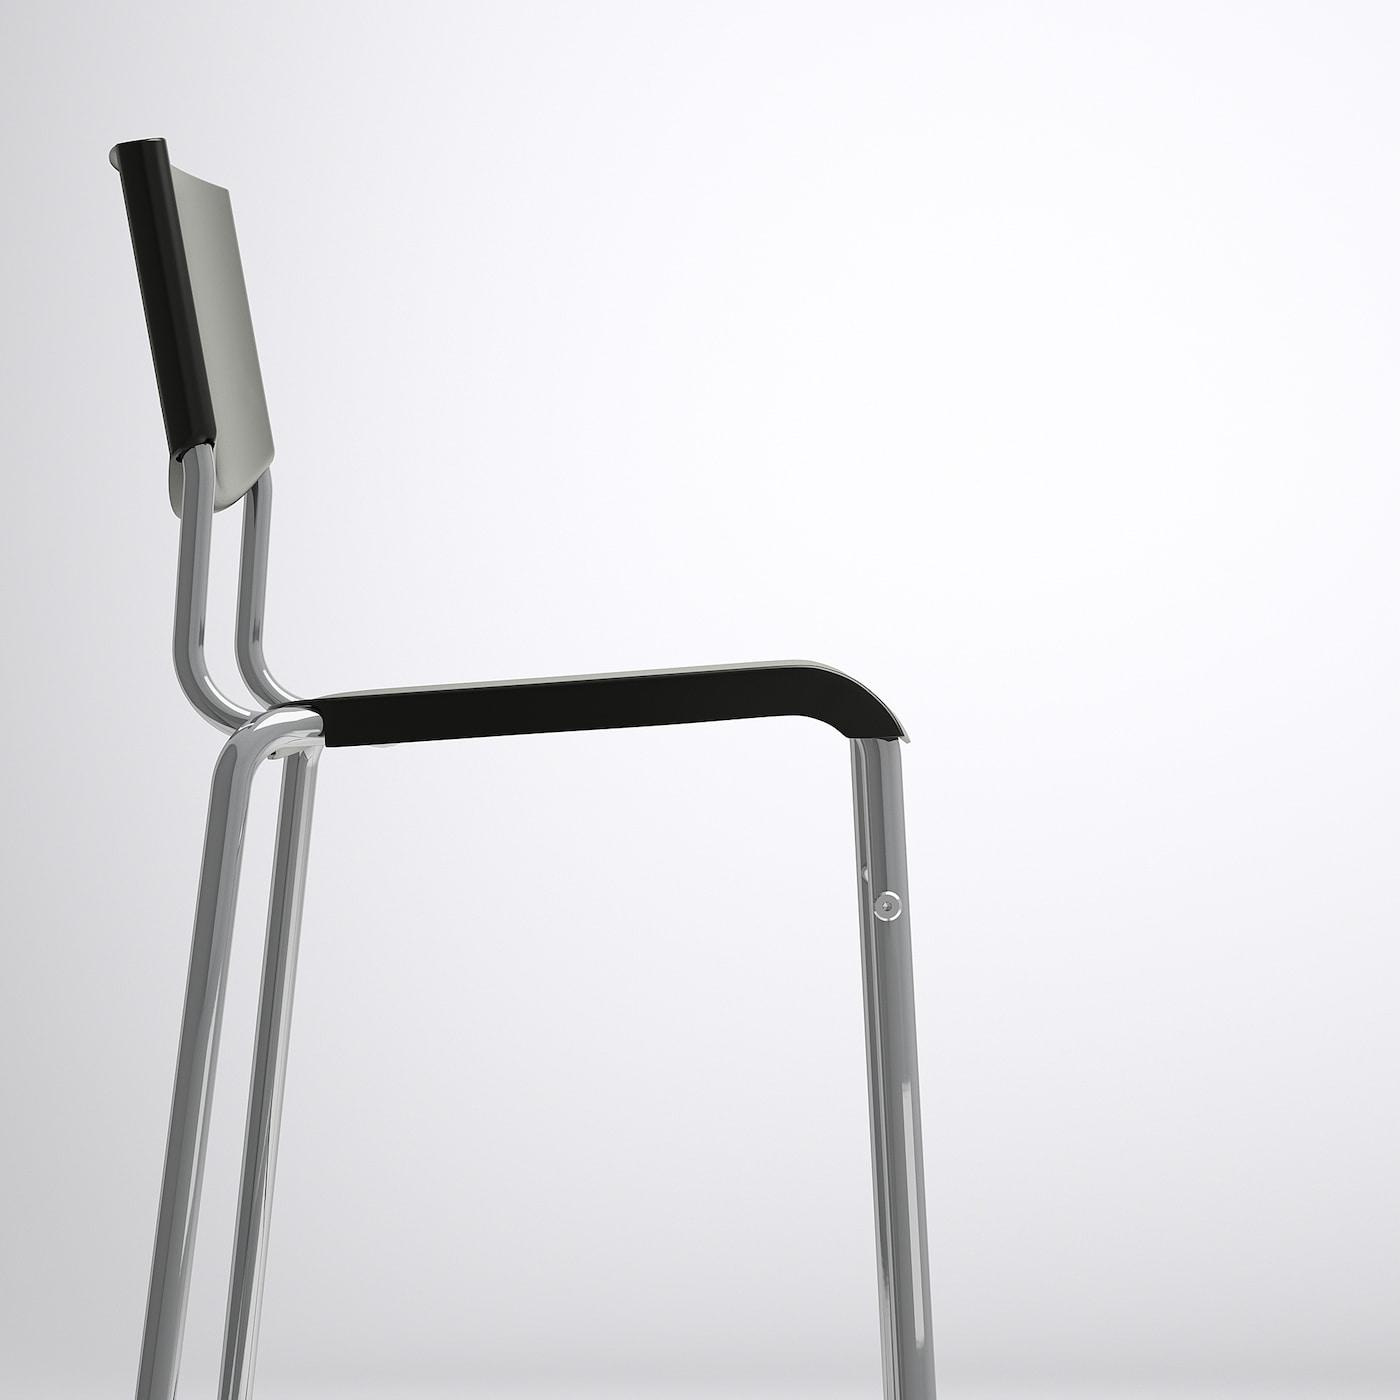 Home Furniture Diy Benches 63cm Sitzhocker Ikea Stig Barhocker In Schwarz Stapelbar Mtmstudioclub Com